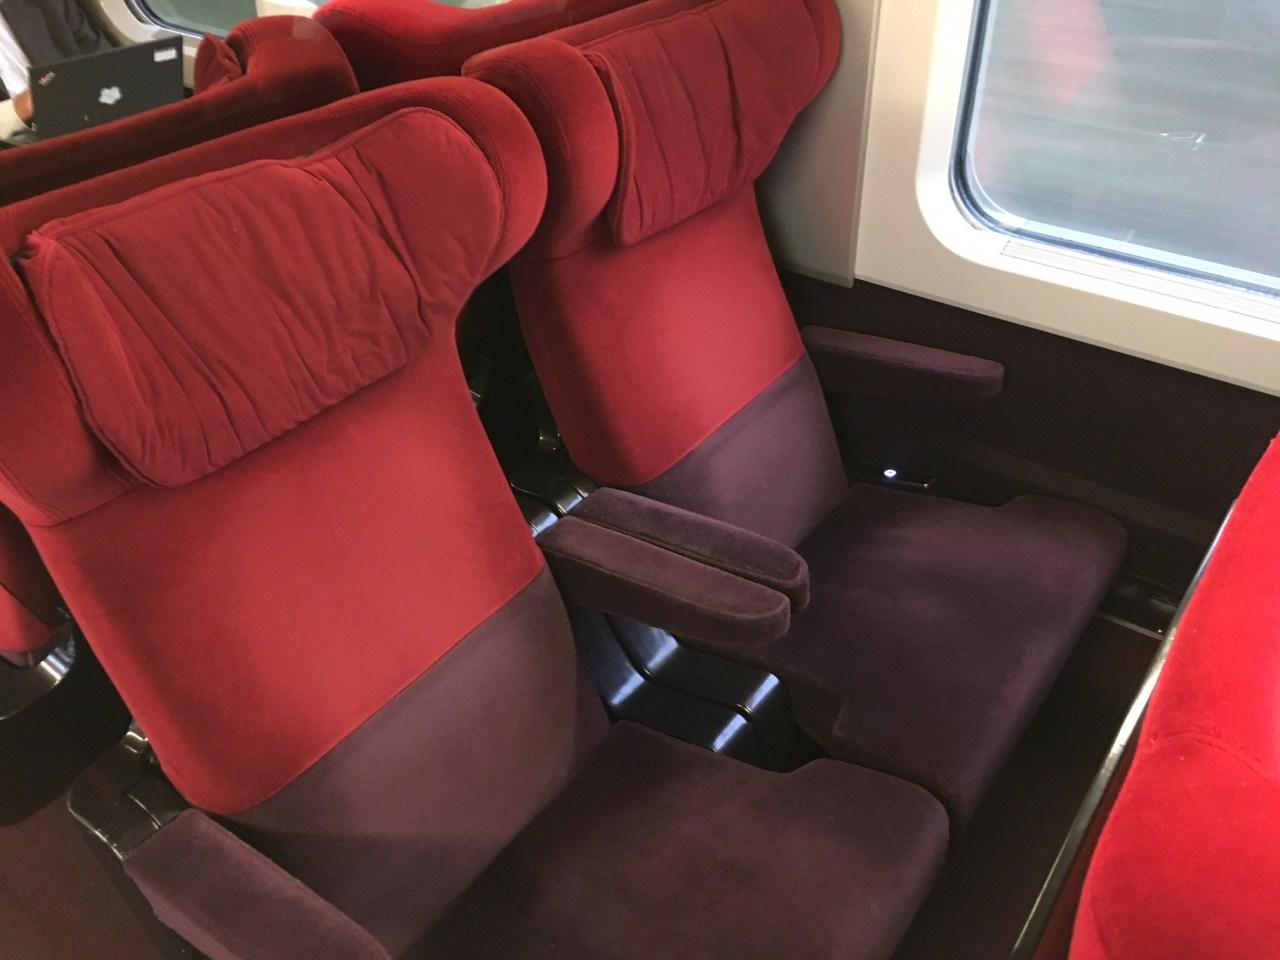 Thalys First Class Comfort 1 Seats